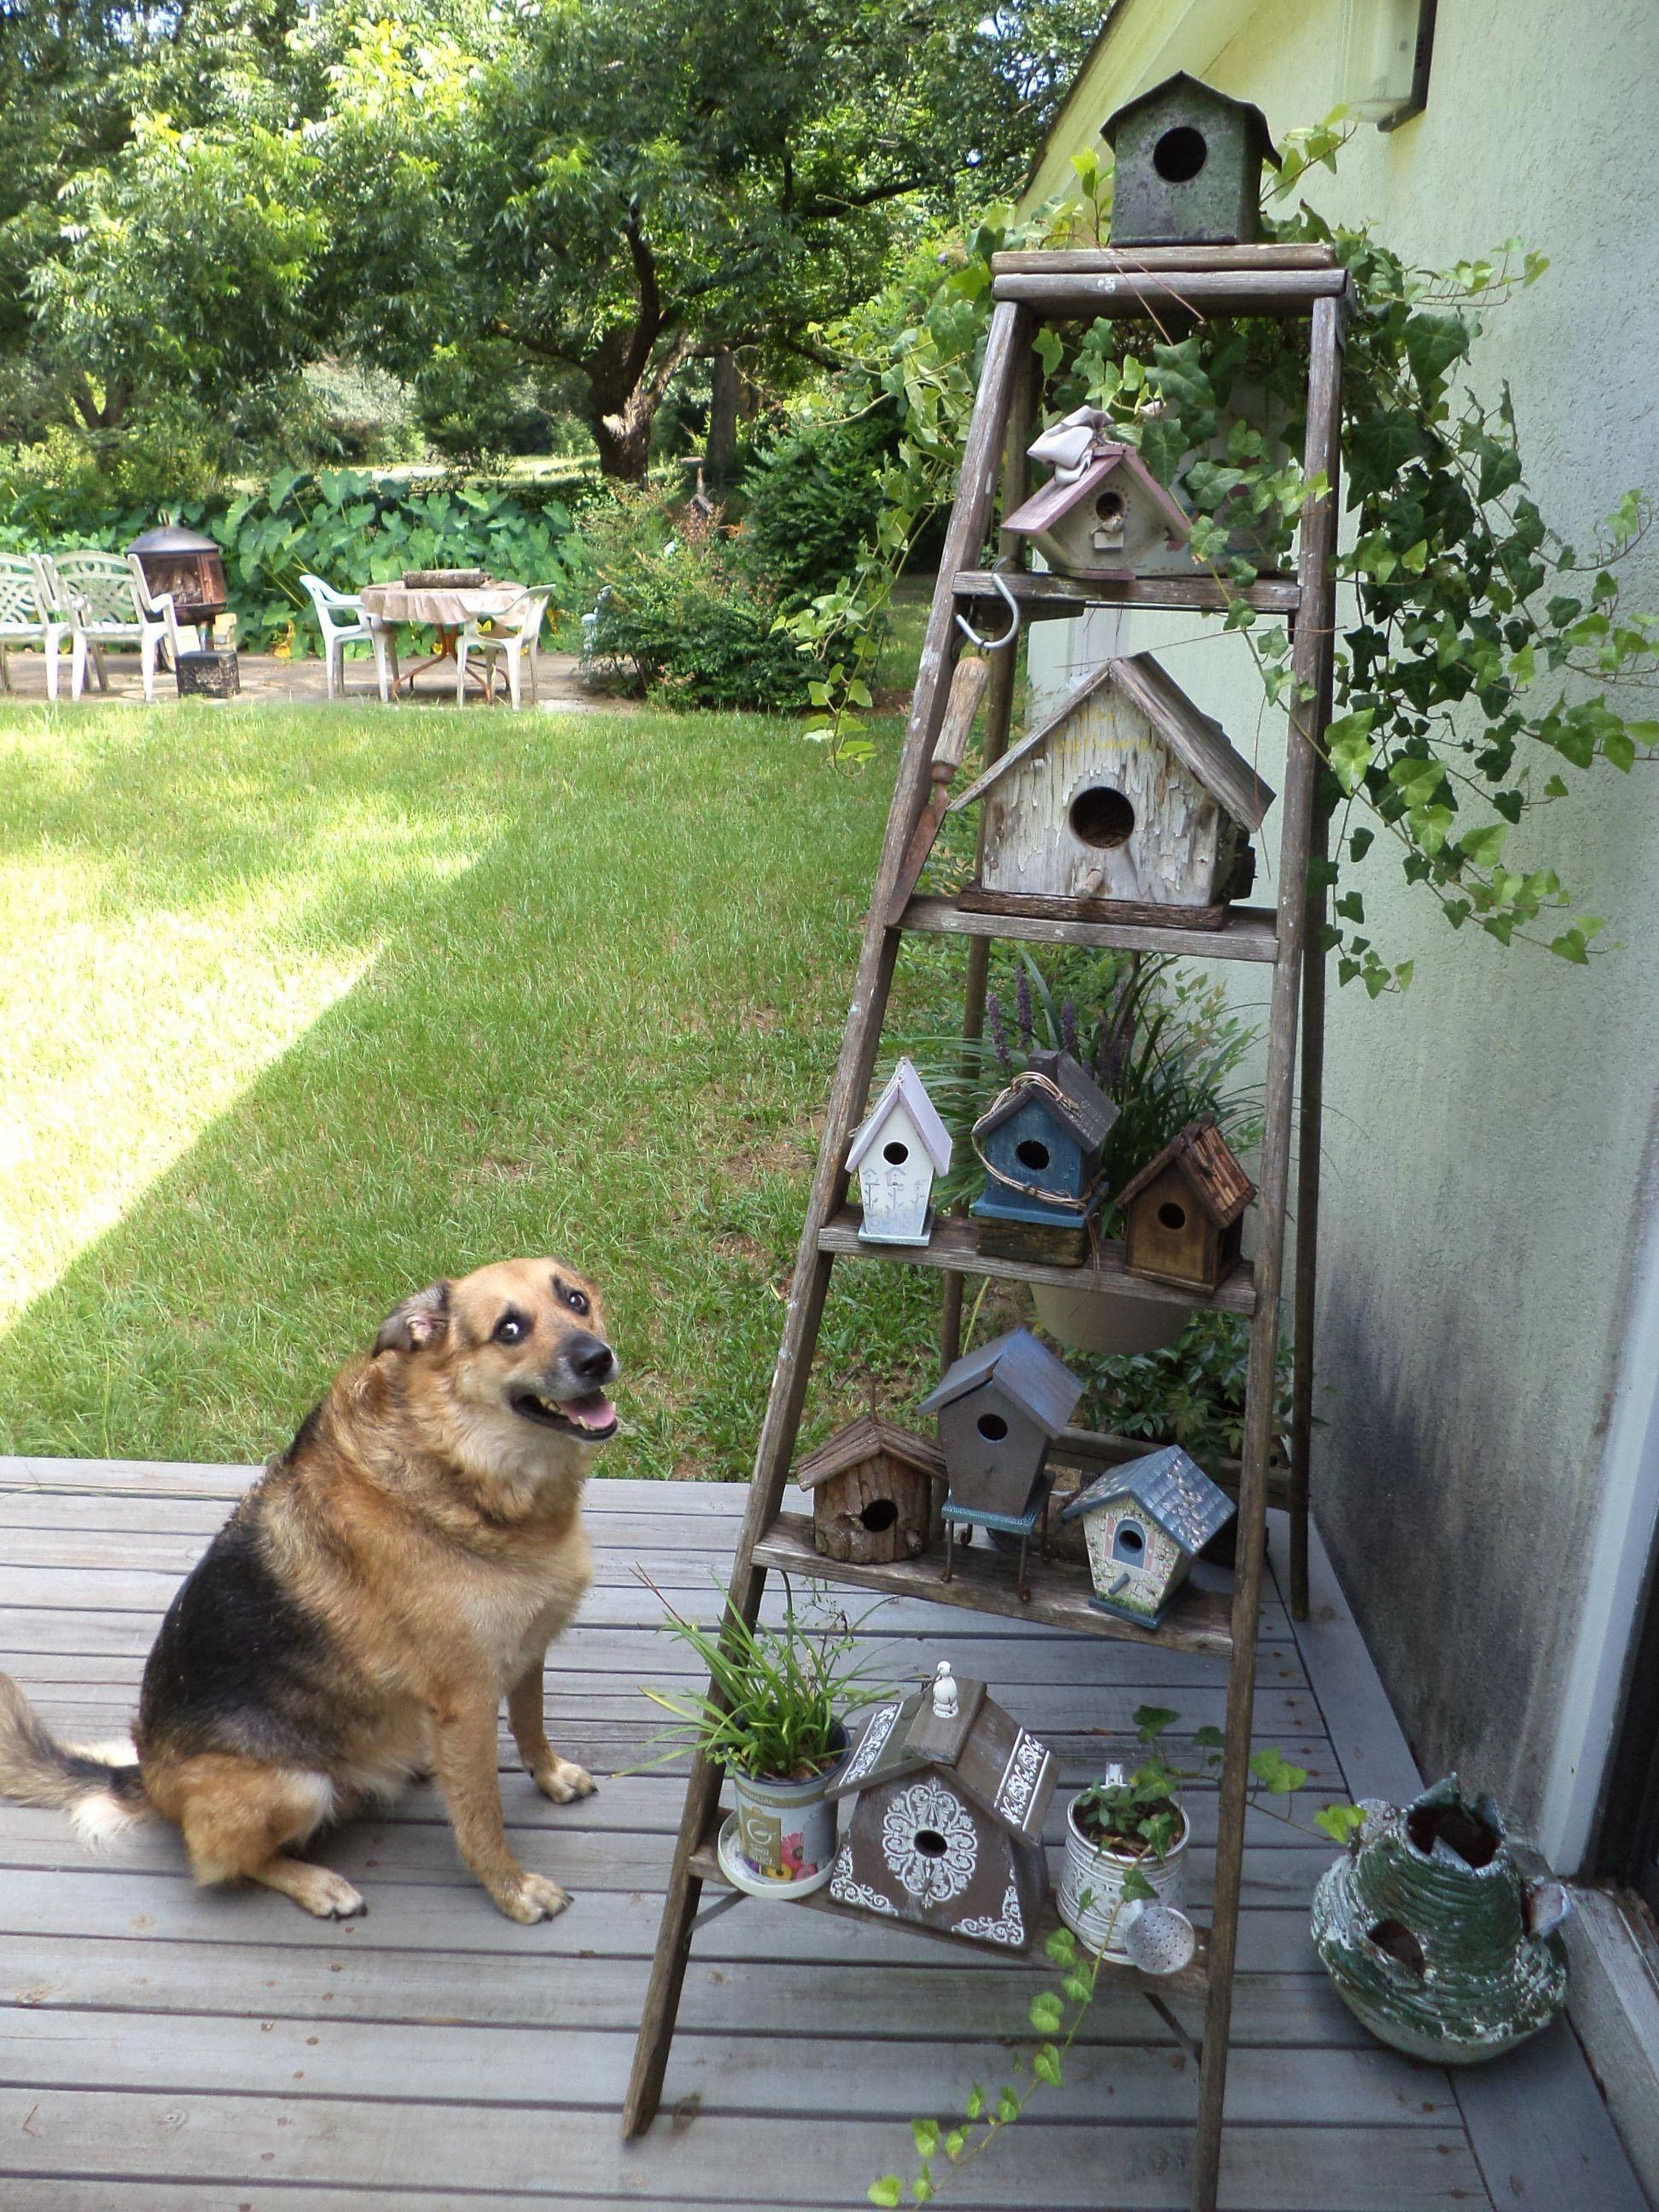 Anther Ladder new birdhouses on daddy's old ladder #birdhousetips   garden